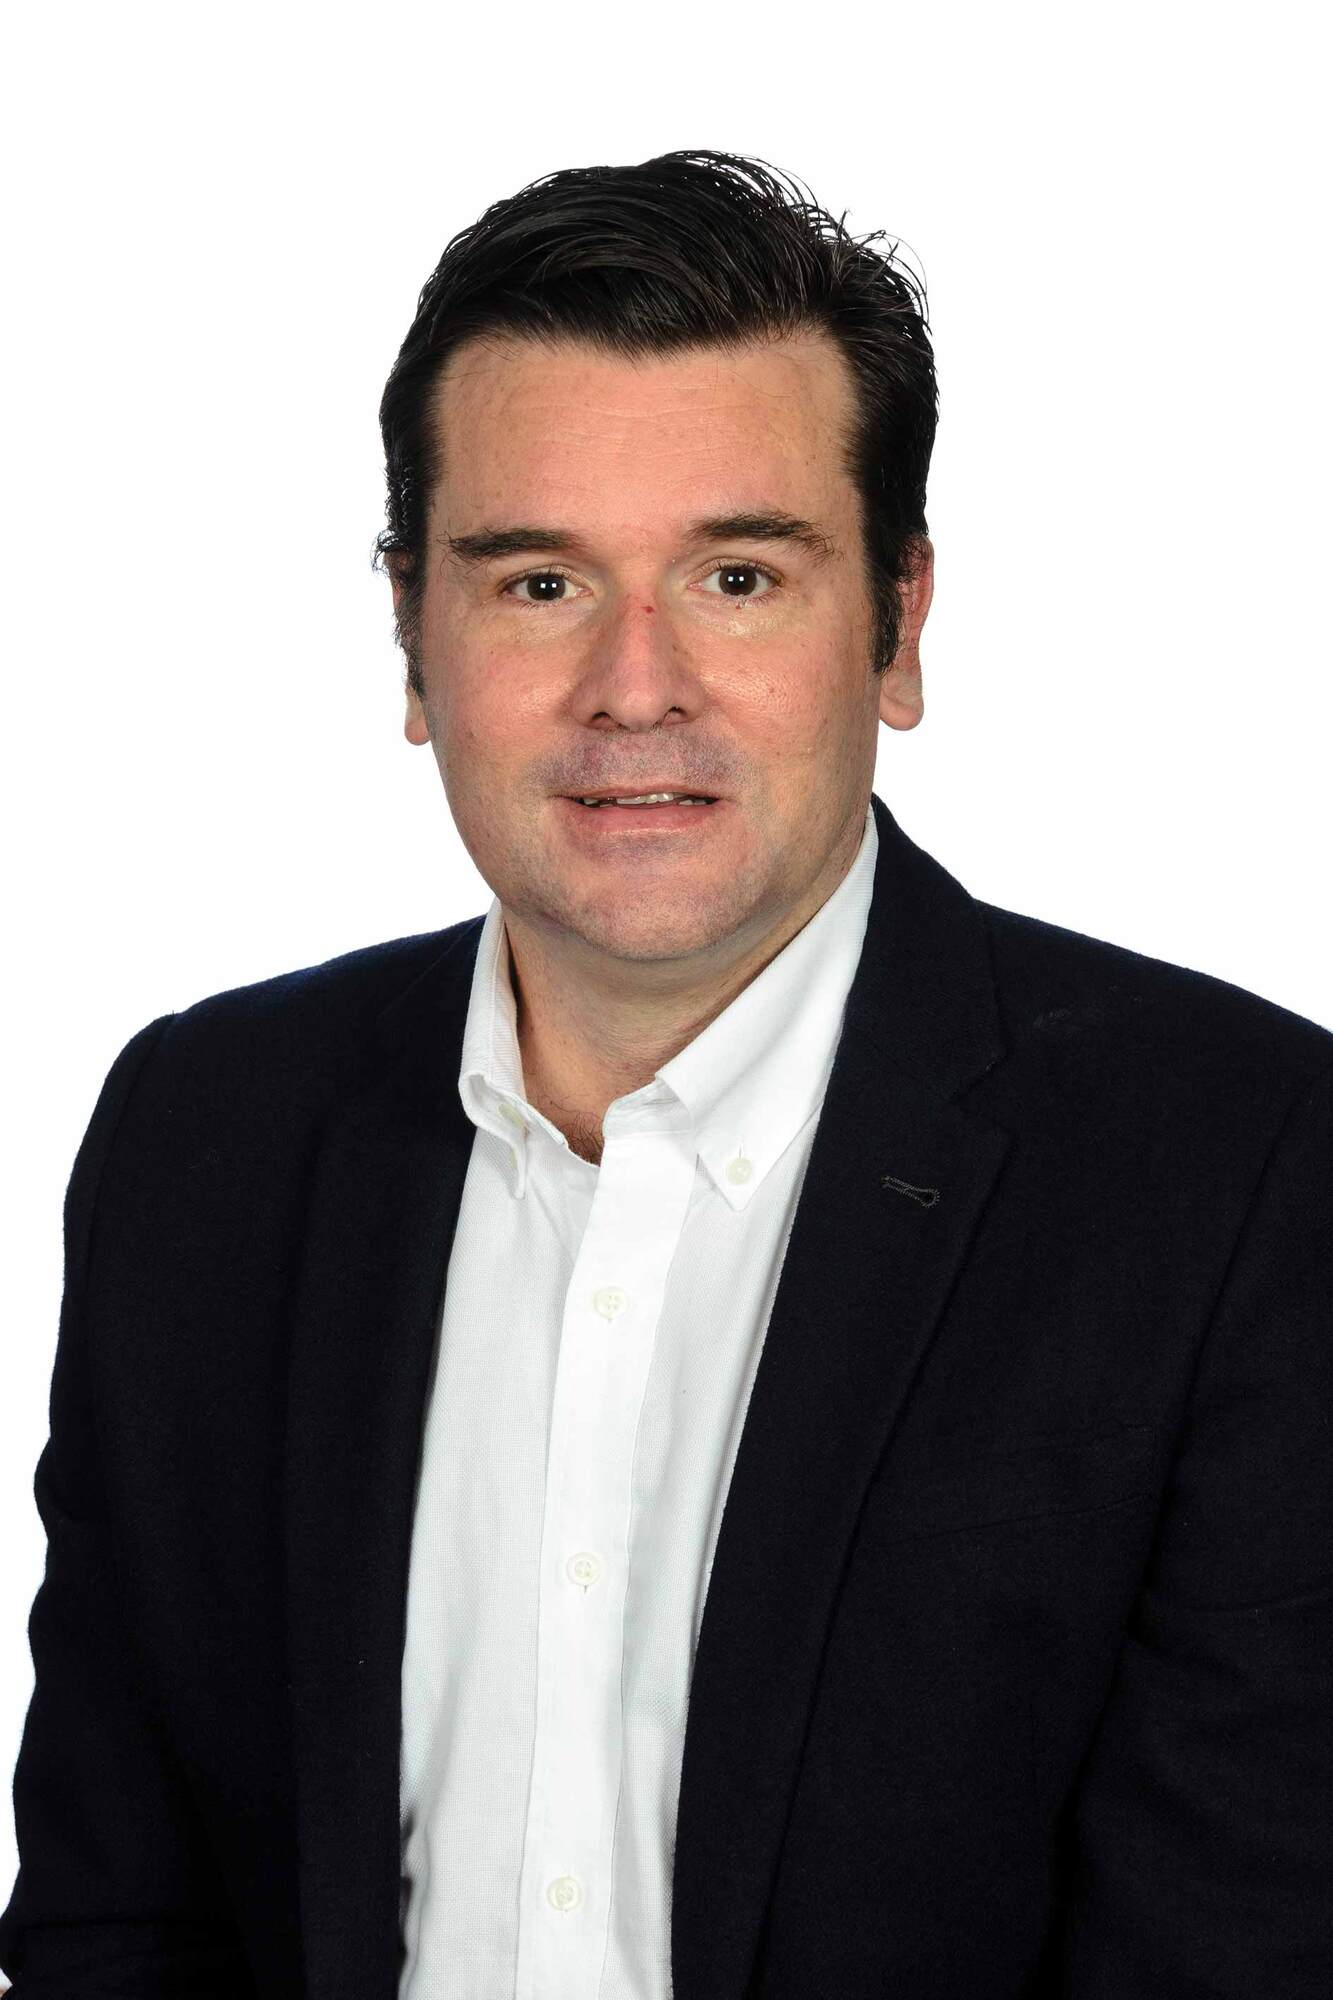 Marcelo Moreno Montenegro